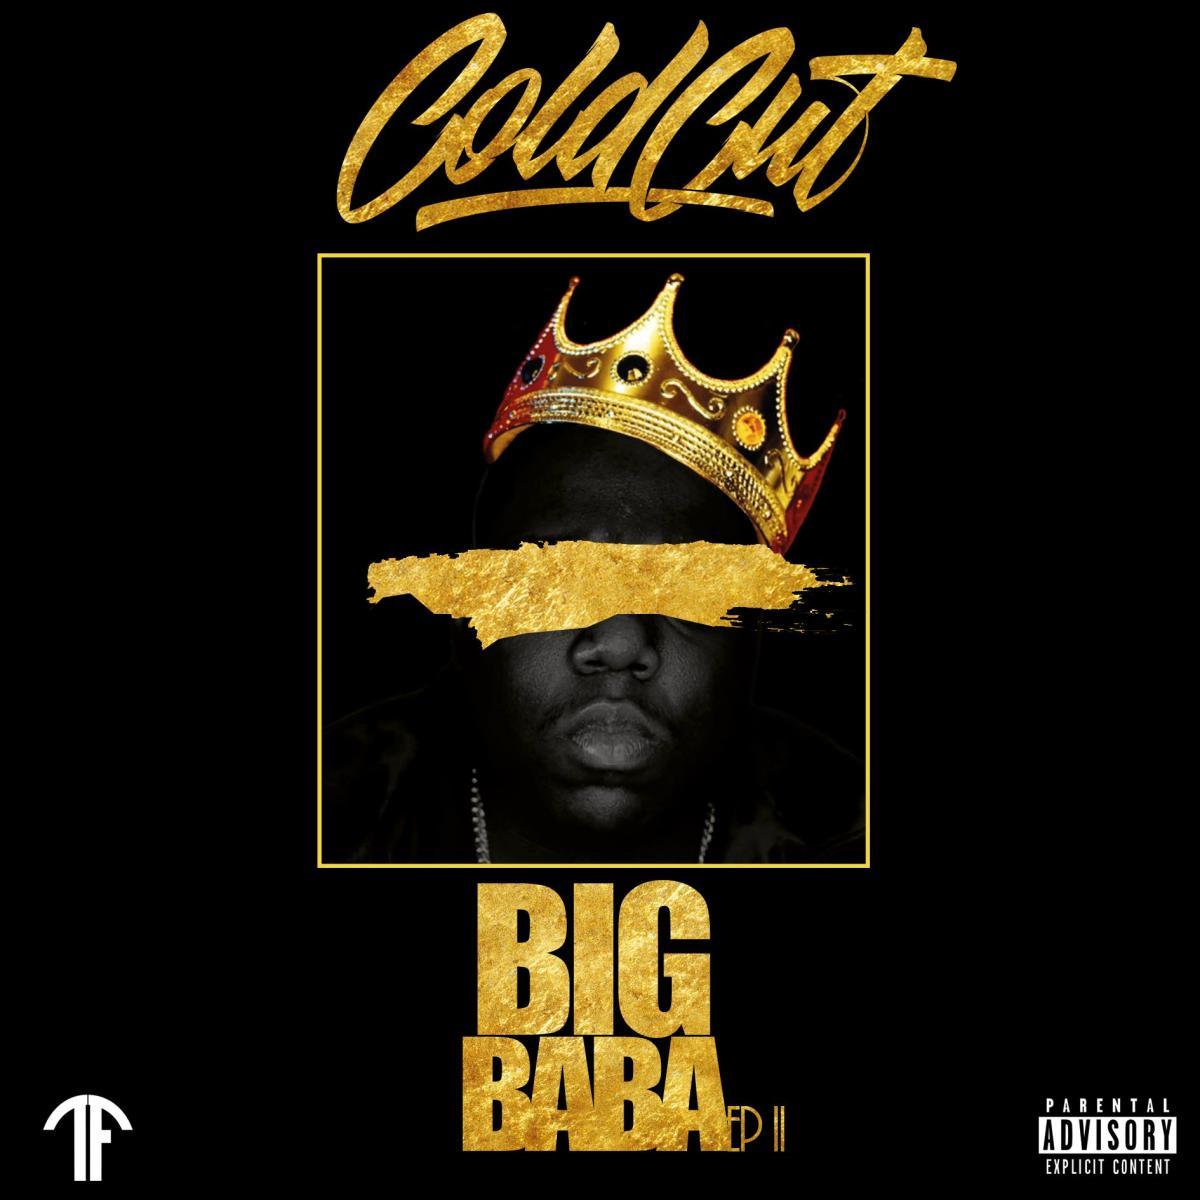 Upcoming: DJ Cold Cut - Notorious BIG: Big Baba Ep II (Free Download)